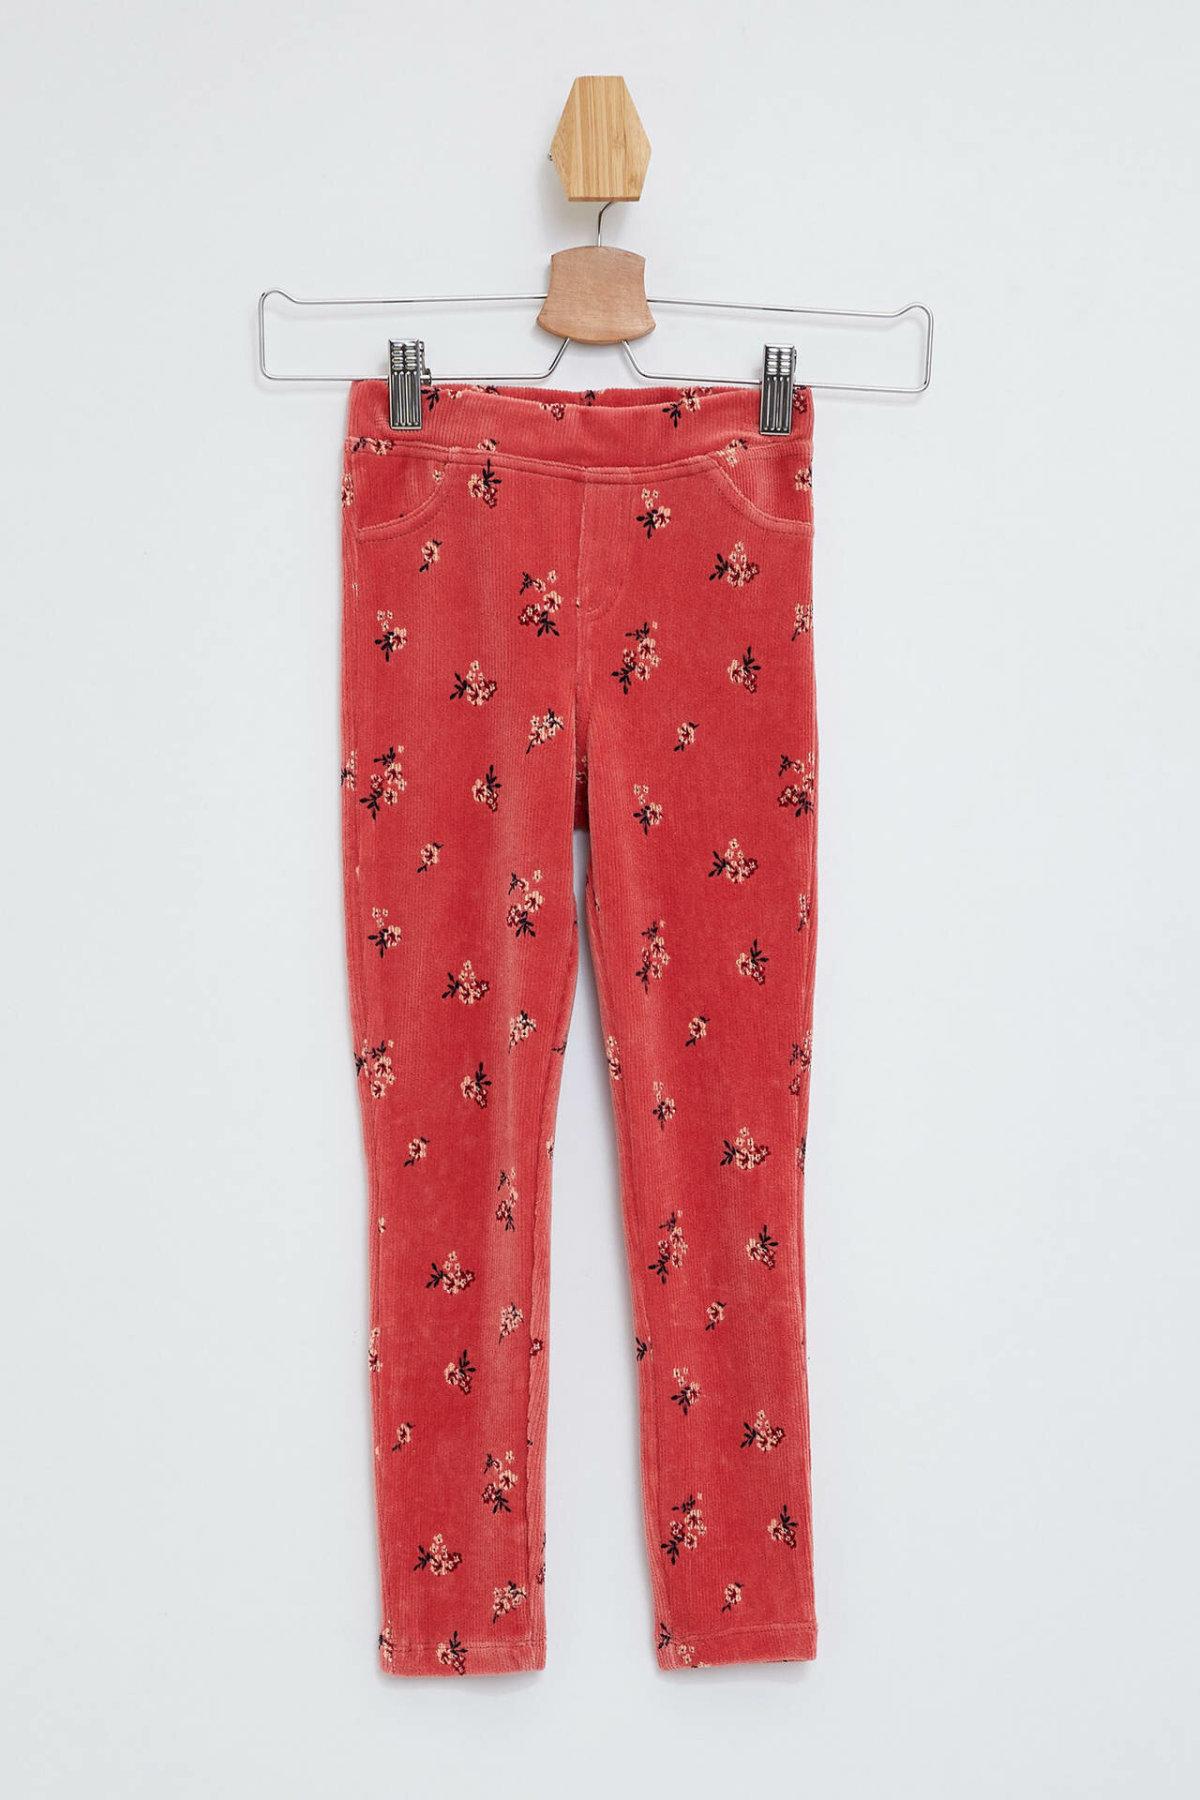 DeFacto Fashion Girl Leggings Cotton Print Pattern Comfort Pants Kids Casual Elastic Waist Skinny Sportpant Girls-L7931A619AU